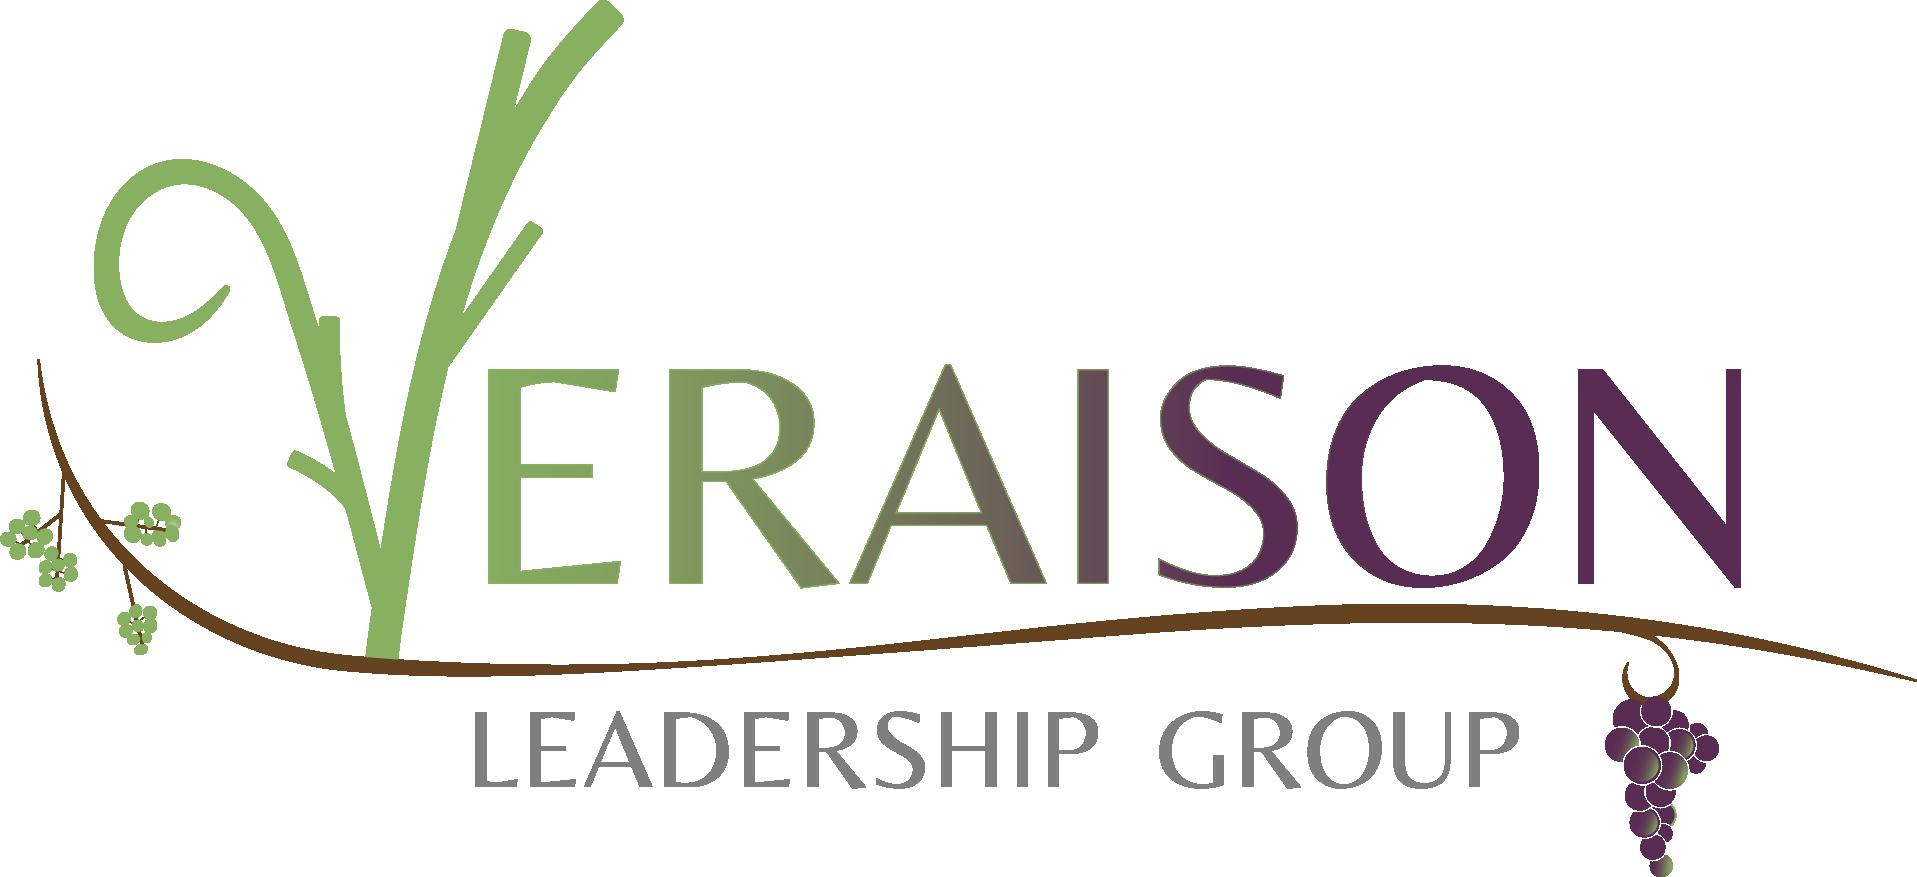 Veraison Leadership Group